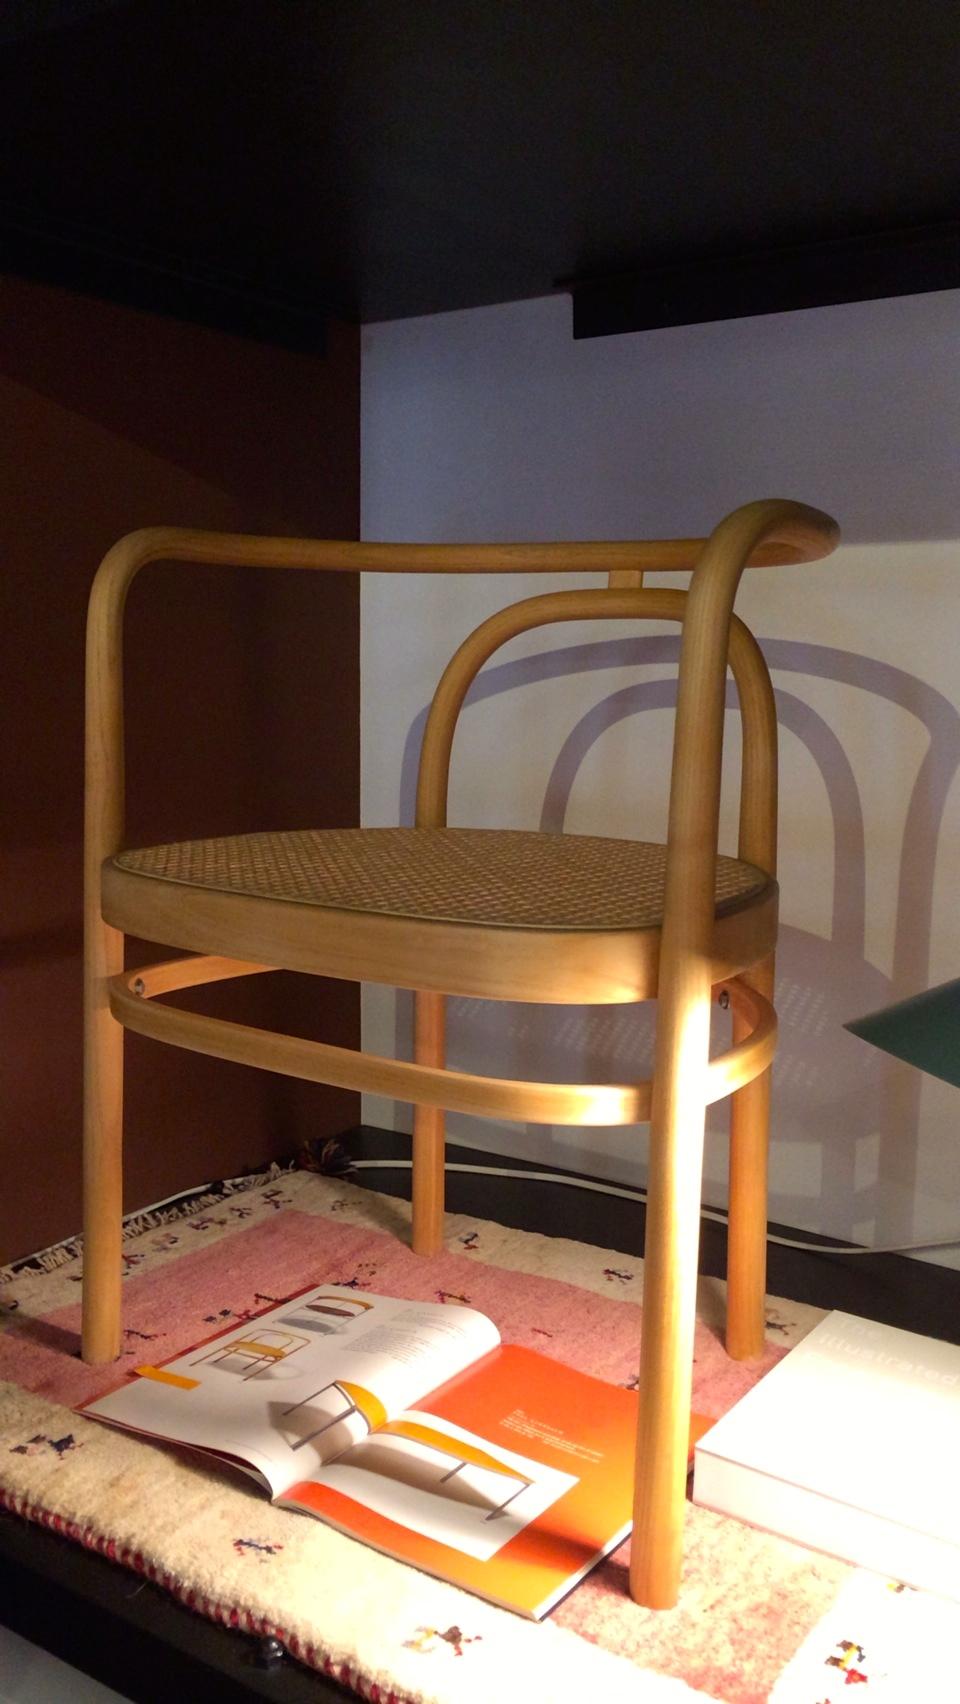 http://www.sora-design.com/images/bl-2434.JPG